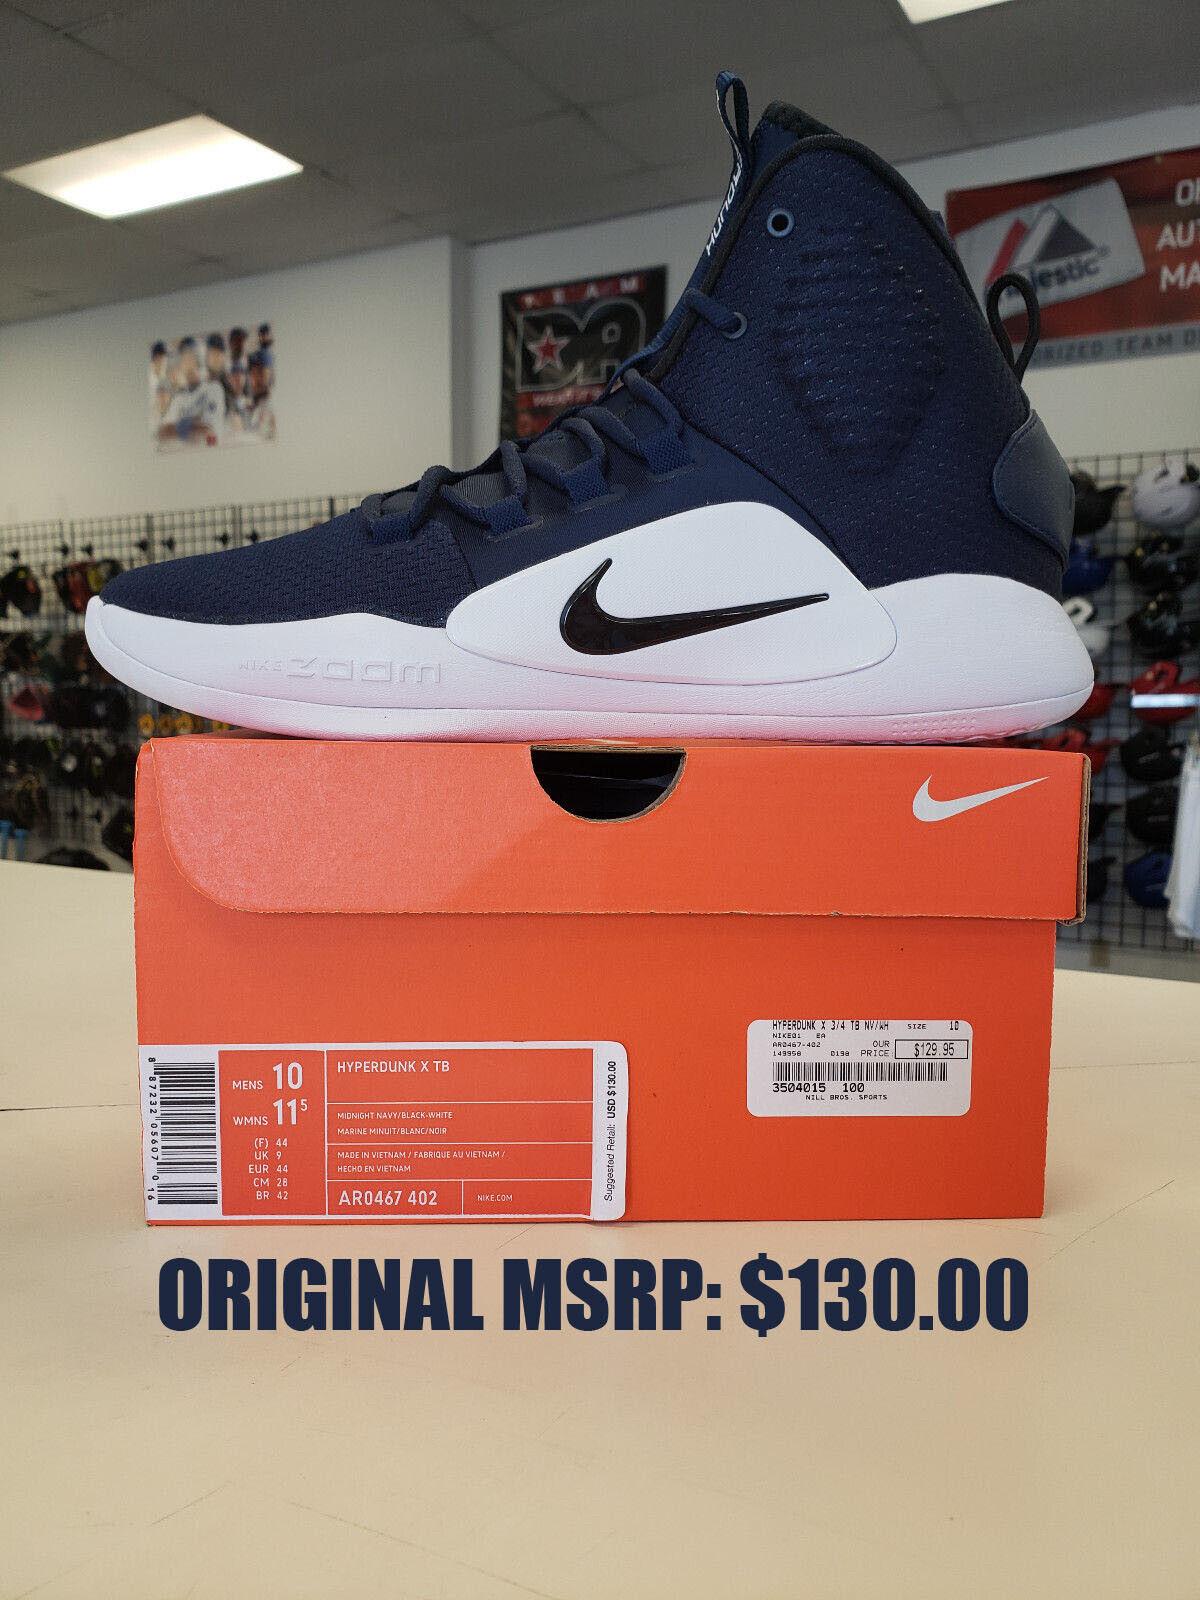 2018 Nike HYPERDUNK X TB Basketball - Midnight Navy - AR0467-402